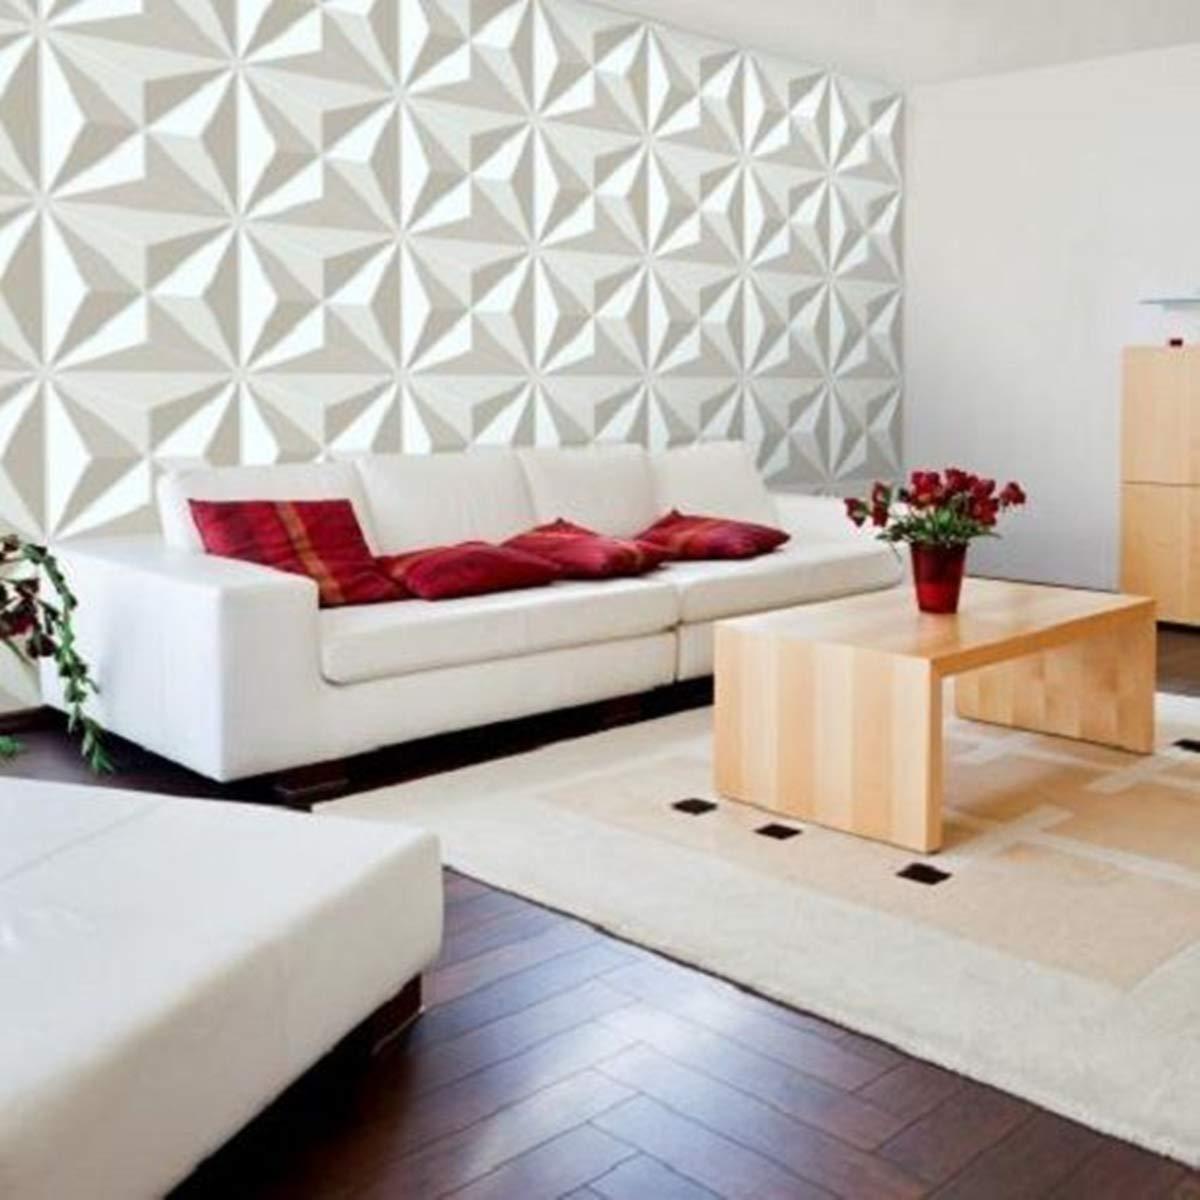 Kisstaker Diamond Wall Papers, 12Pcs 3D PVC Wall Paper Panel Tiles Diamond Design Room Background Home Decor Sticker 500x500mm